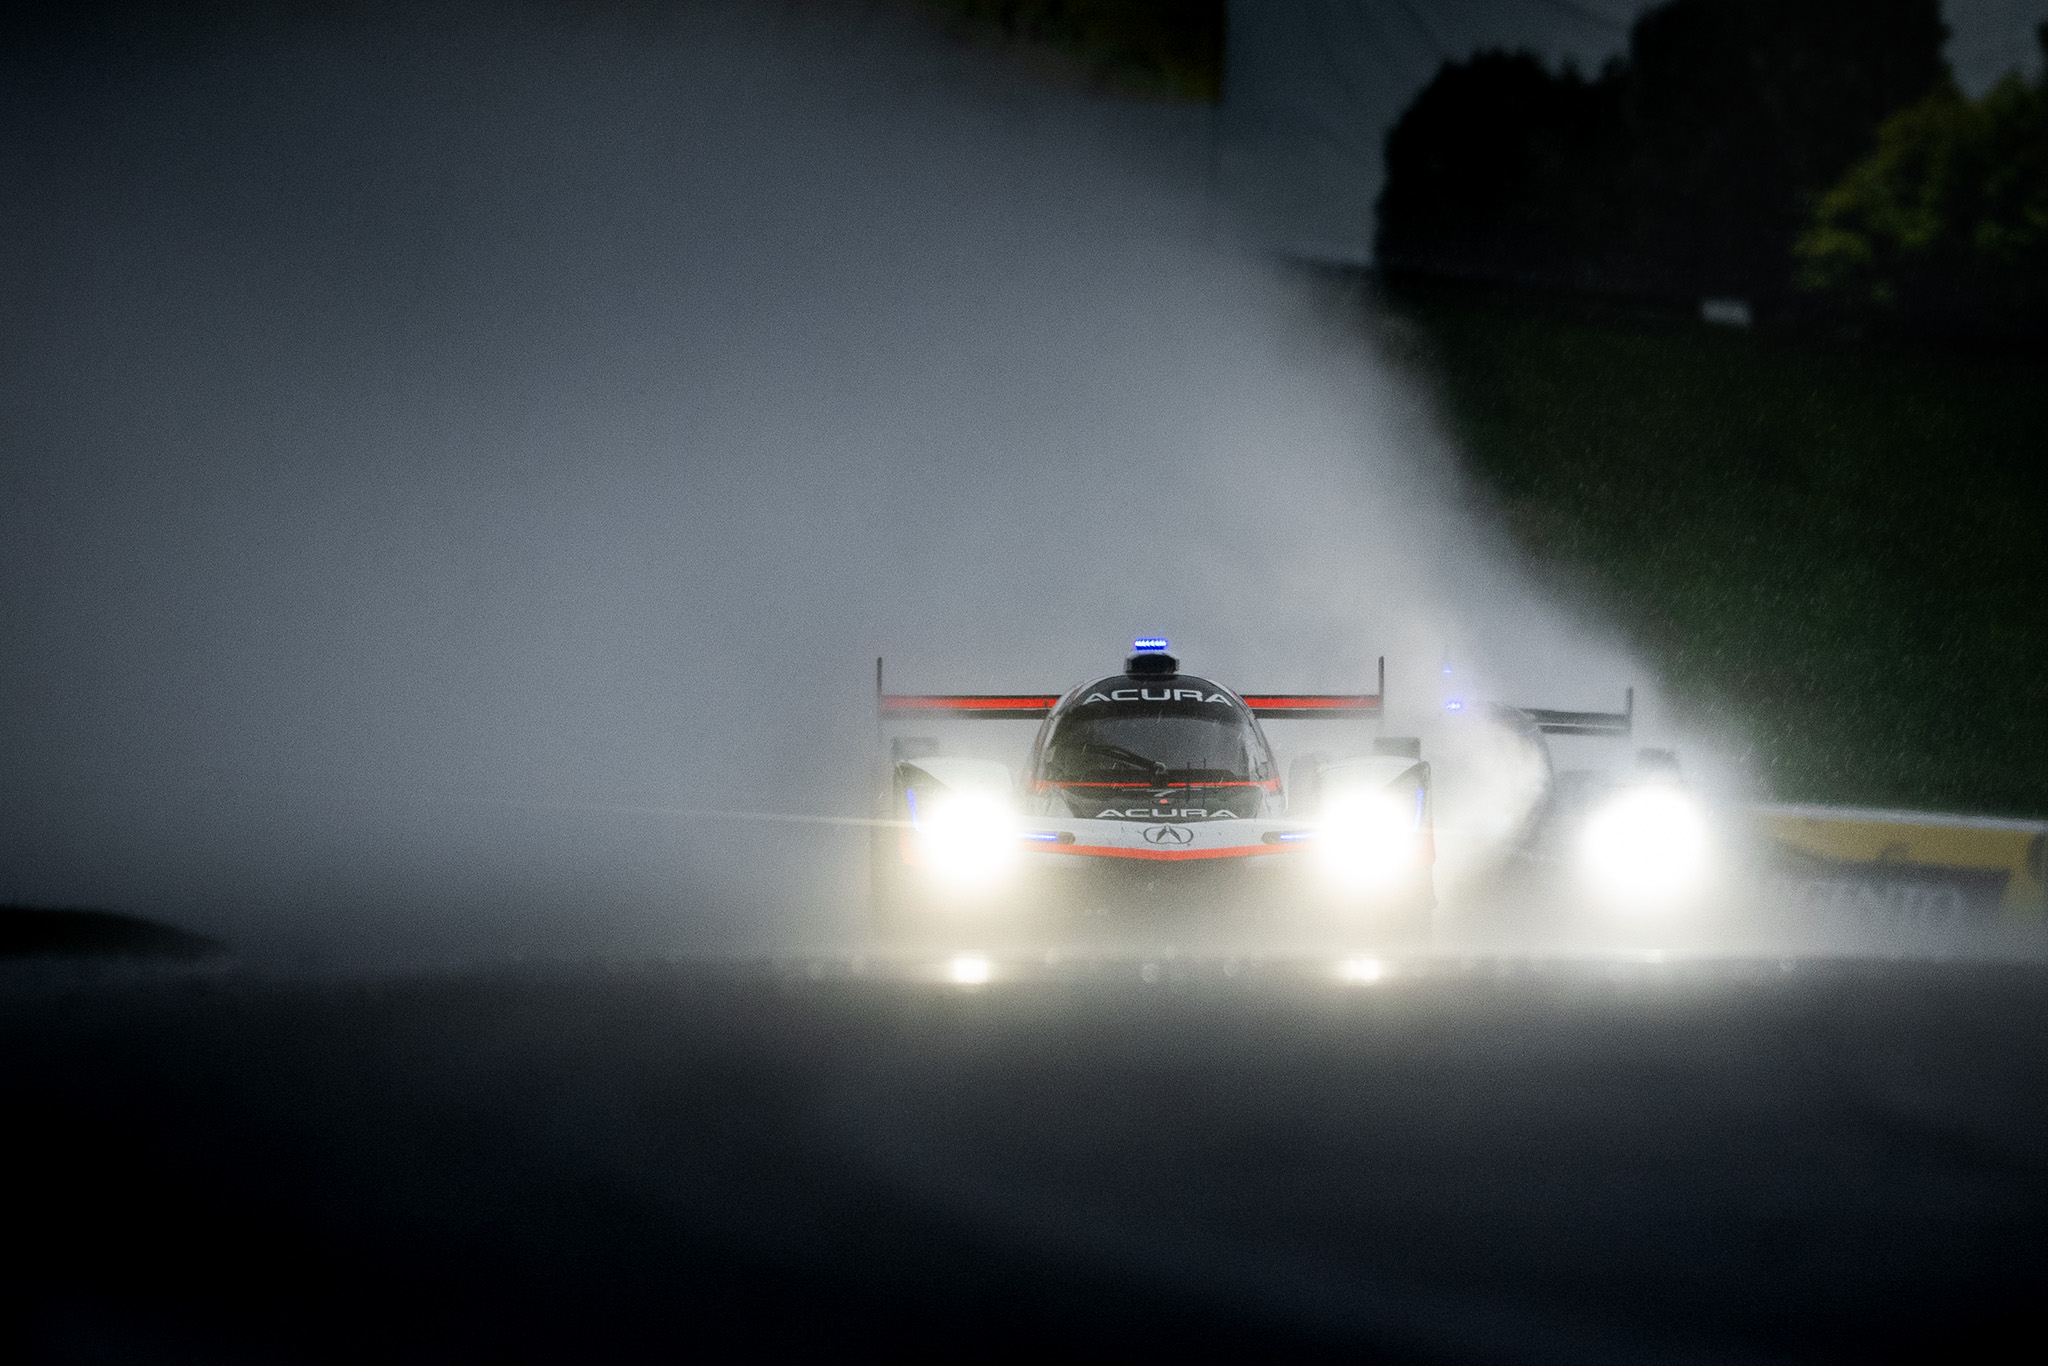 IMSA Road America 2020 WeatherTech Championship series Acura Team Penske ARX-05 DPi racing in the rain Luke Munnell motorsports photography